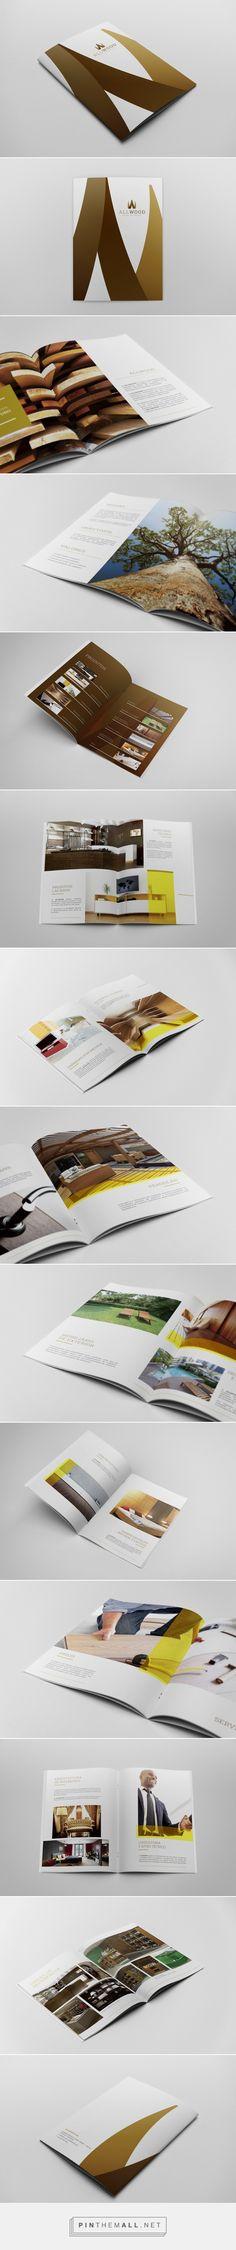 Allwood Catalogue by Miagrphx & João Fernandes #mywork #portfolio #allwood